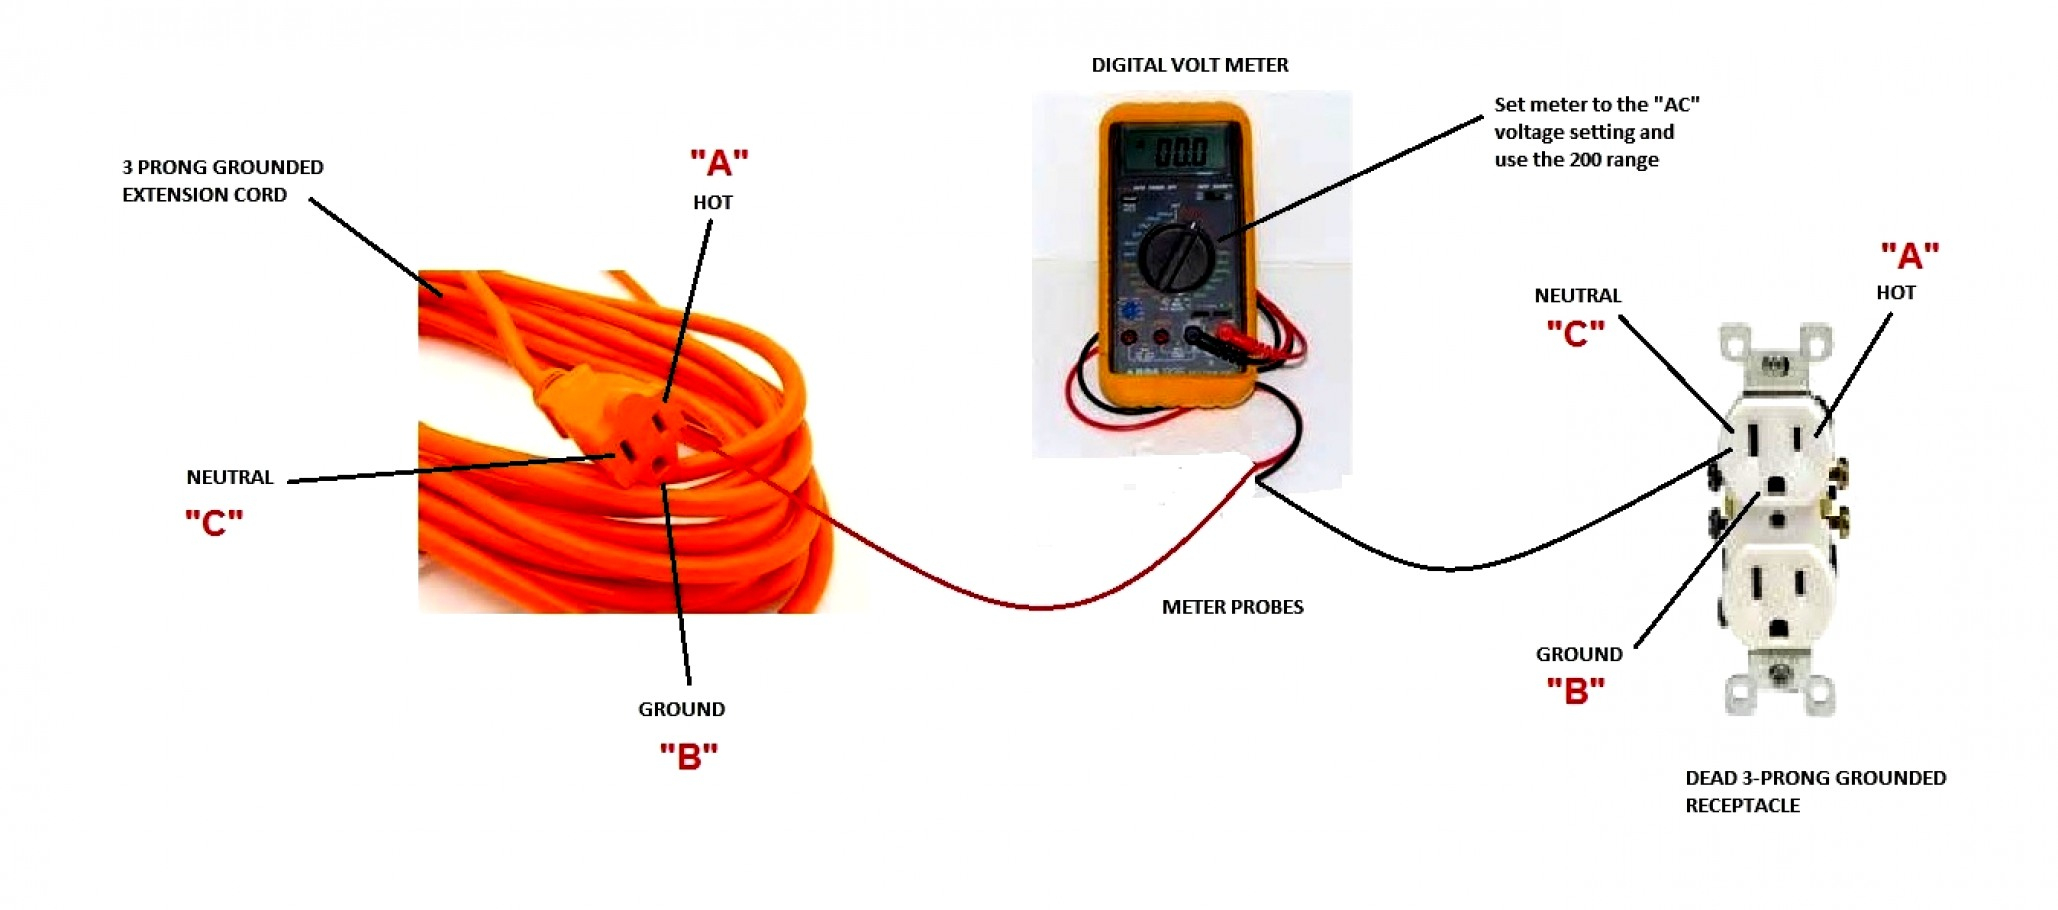 Acs340 Power Cord Wiring Diagram | Wiring Diagram on